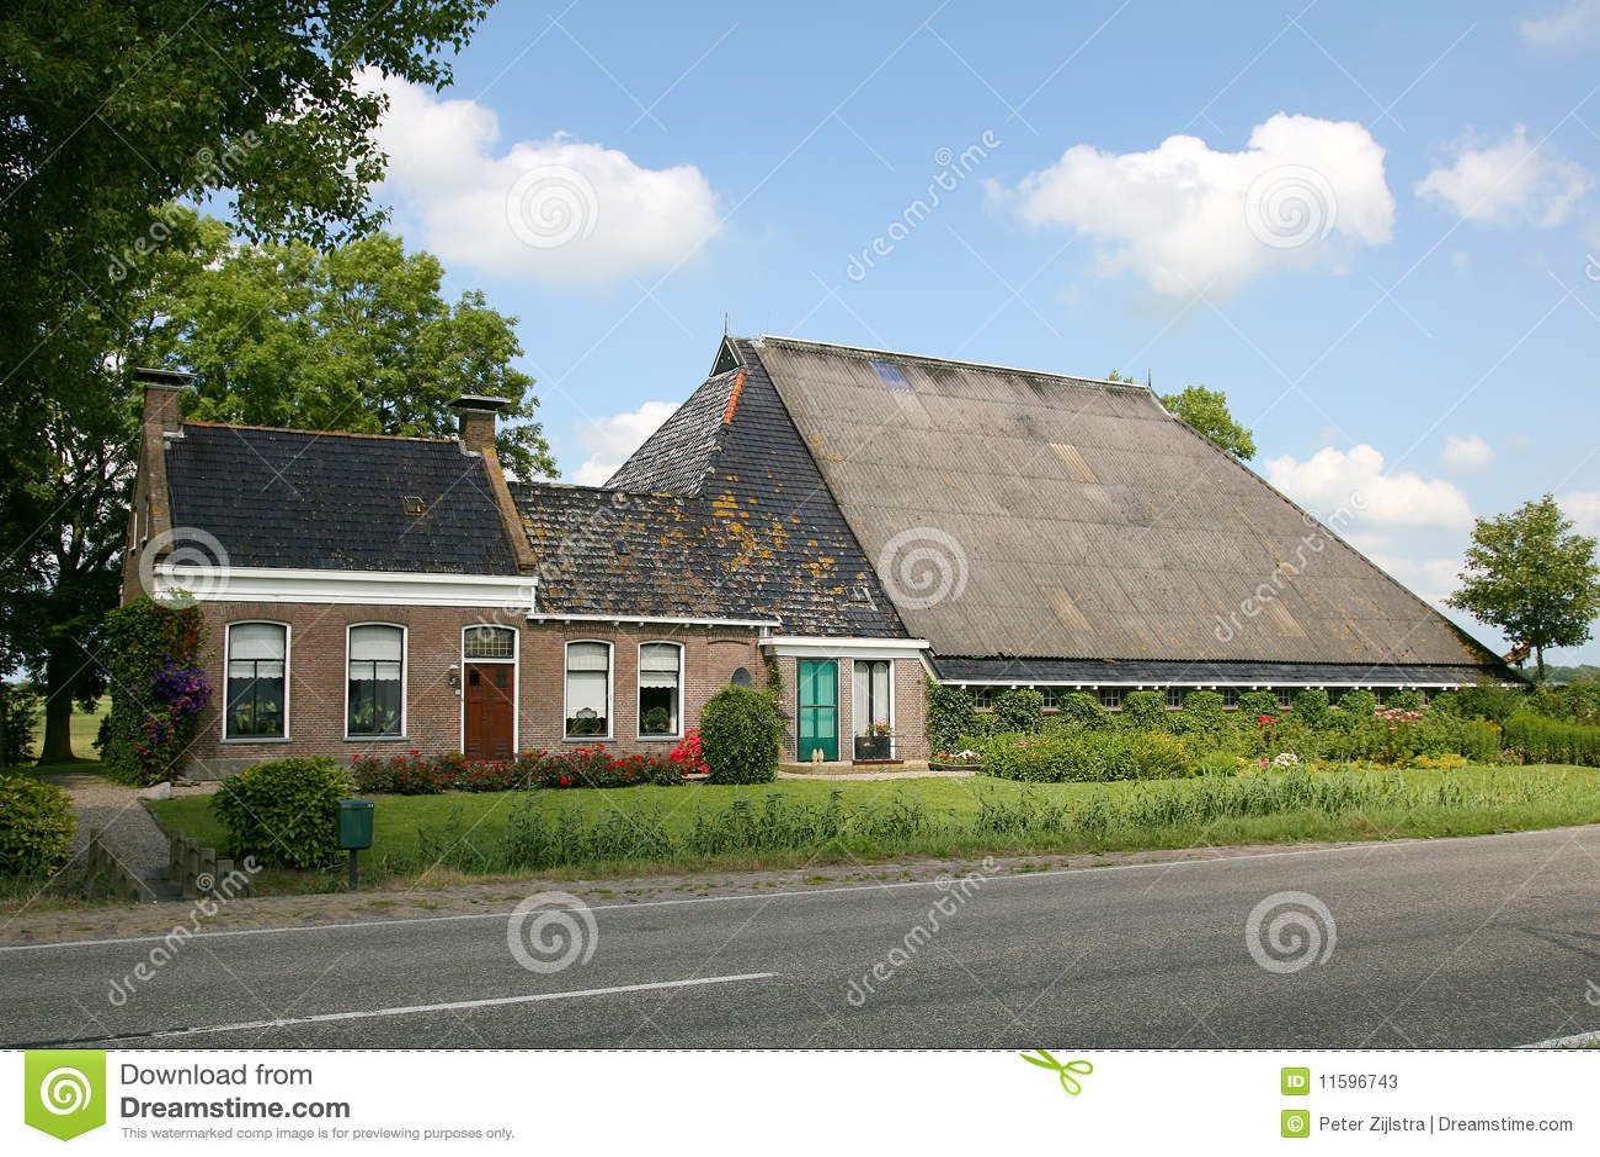 Typical dutch farmhouse stock photos image 11596743 for Farm house netherlands